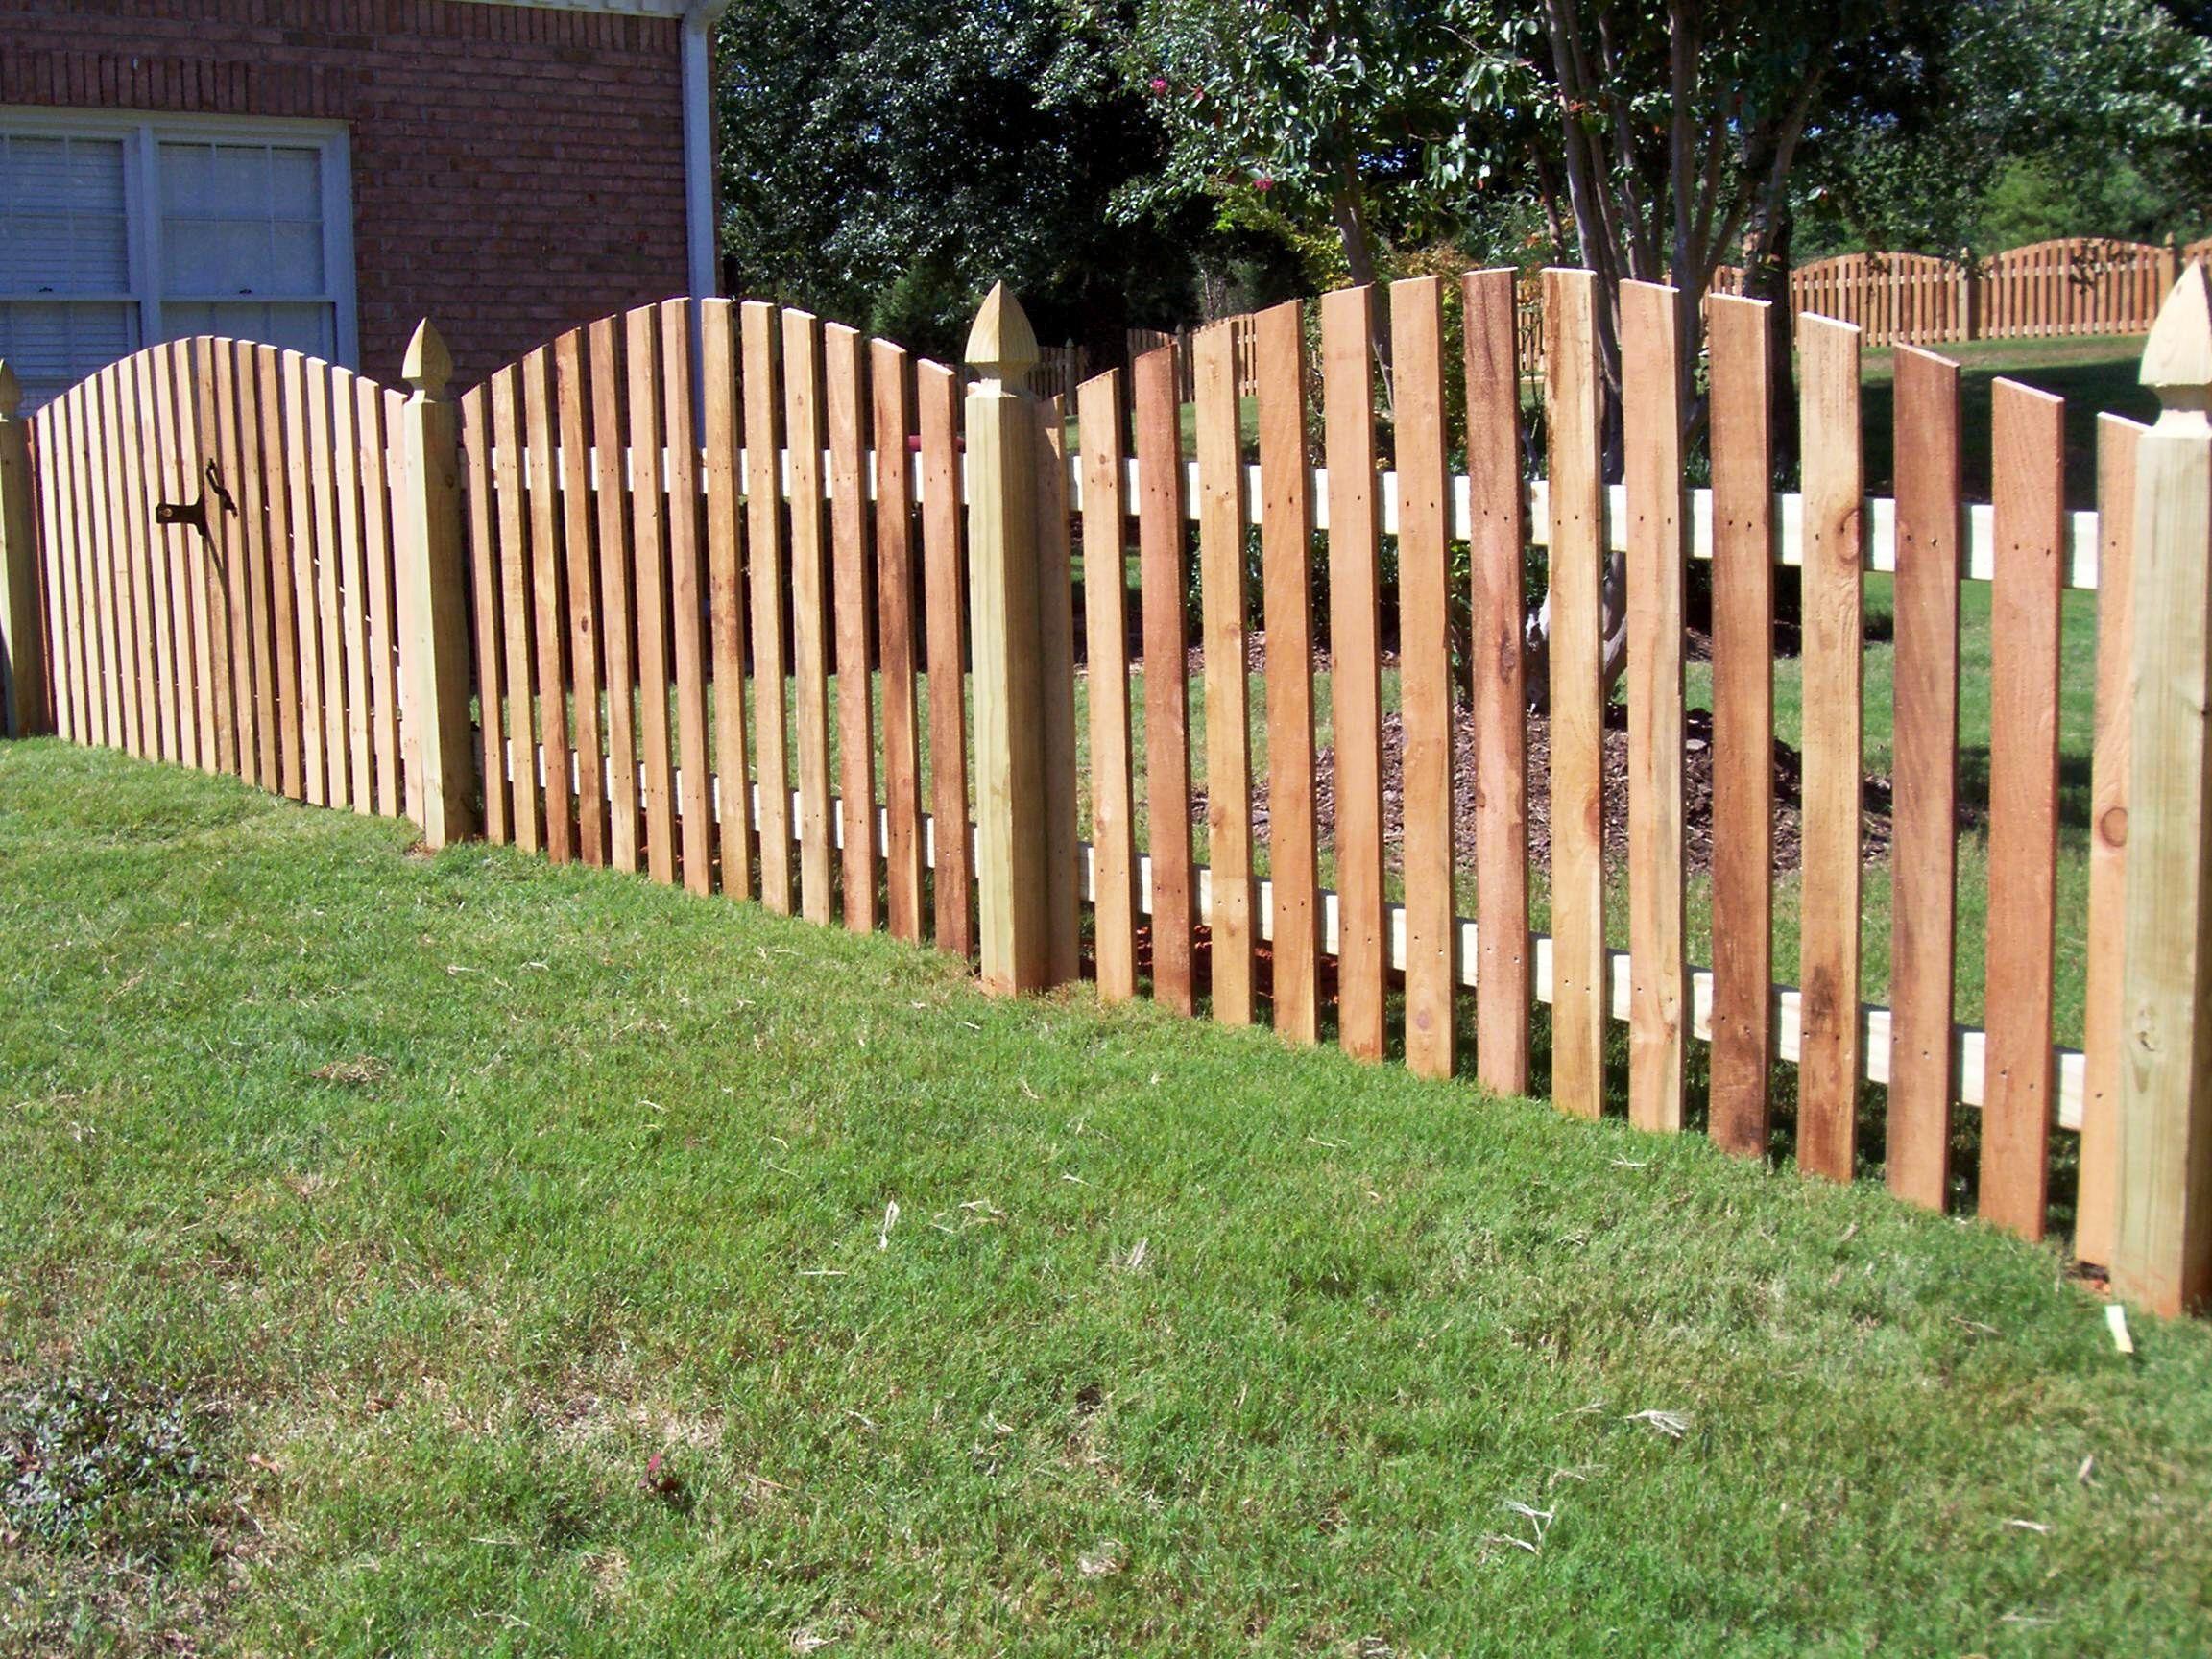 Custom scallop cut wood picket fence design mossy oak fence custom scallop cut wood picket fence design mossy oak fence company orlando melbourne baanklon Choice Image